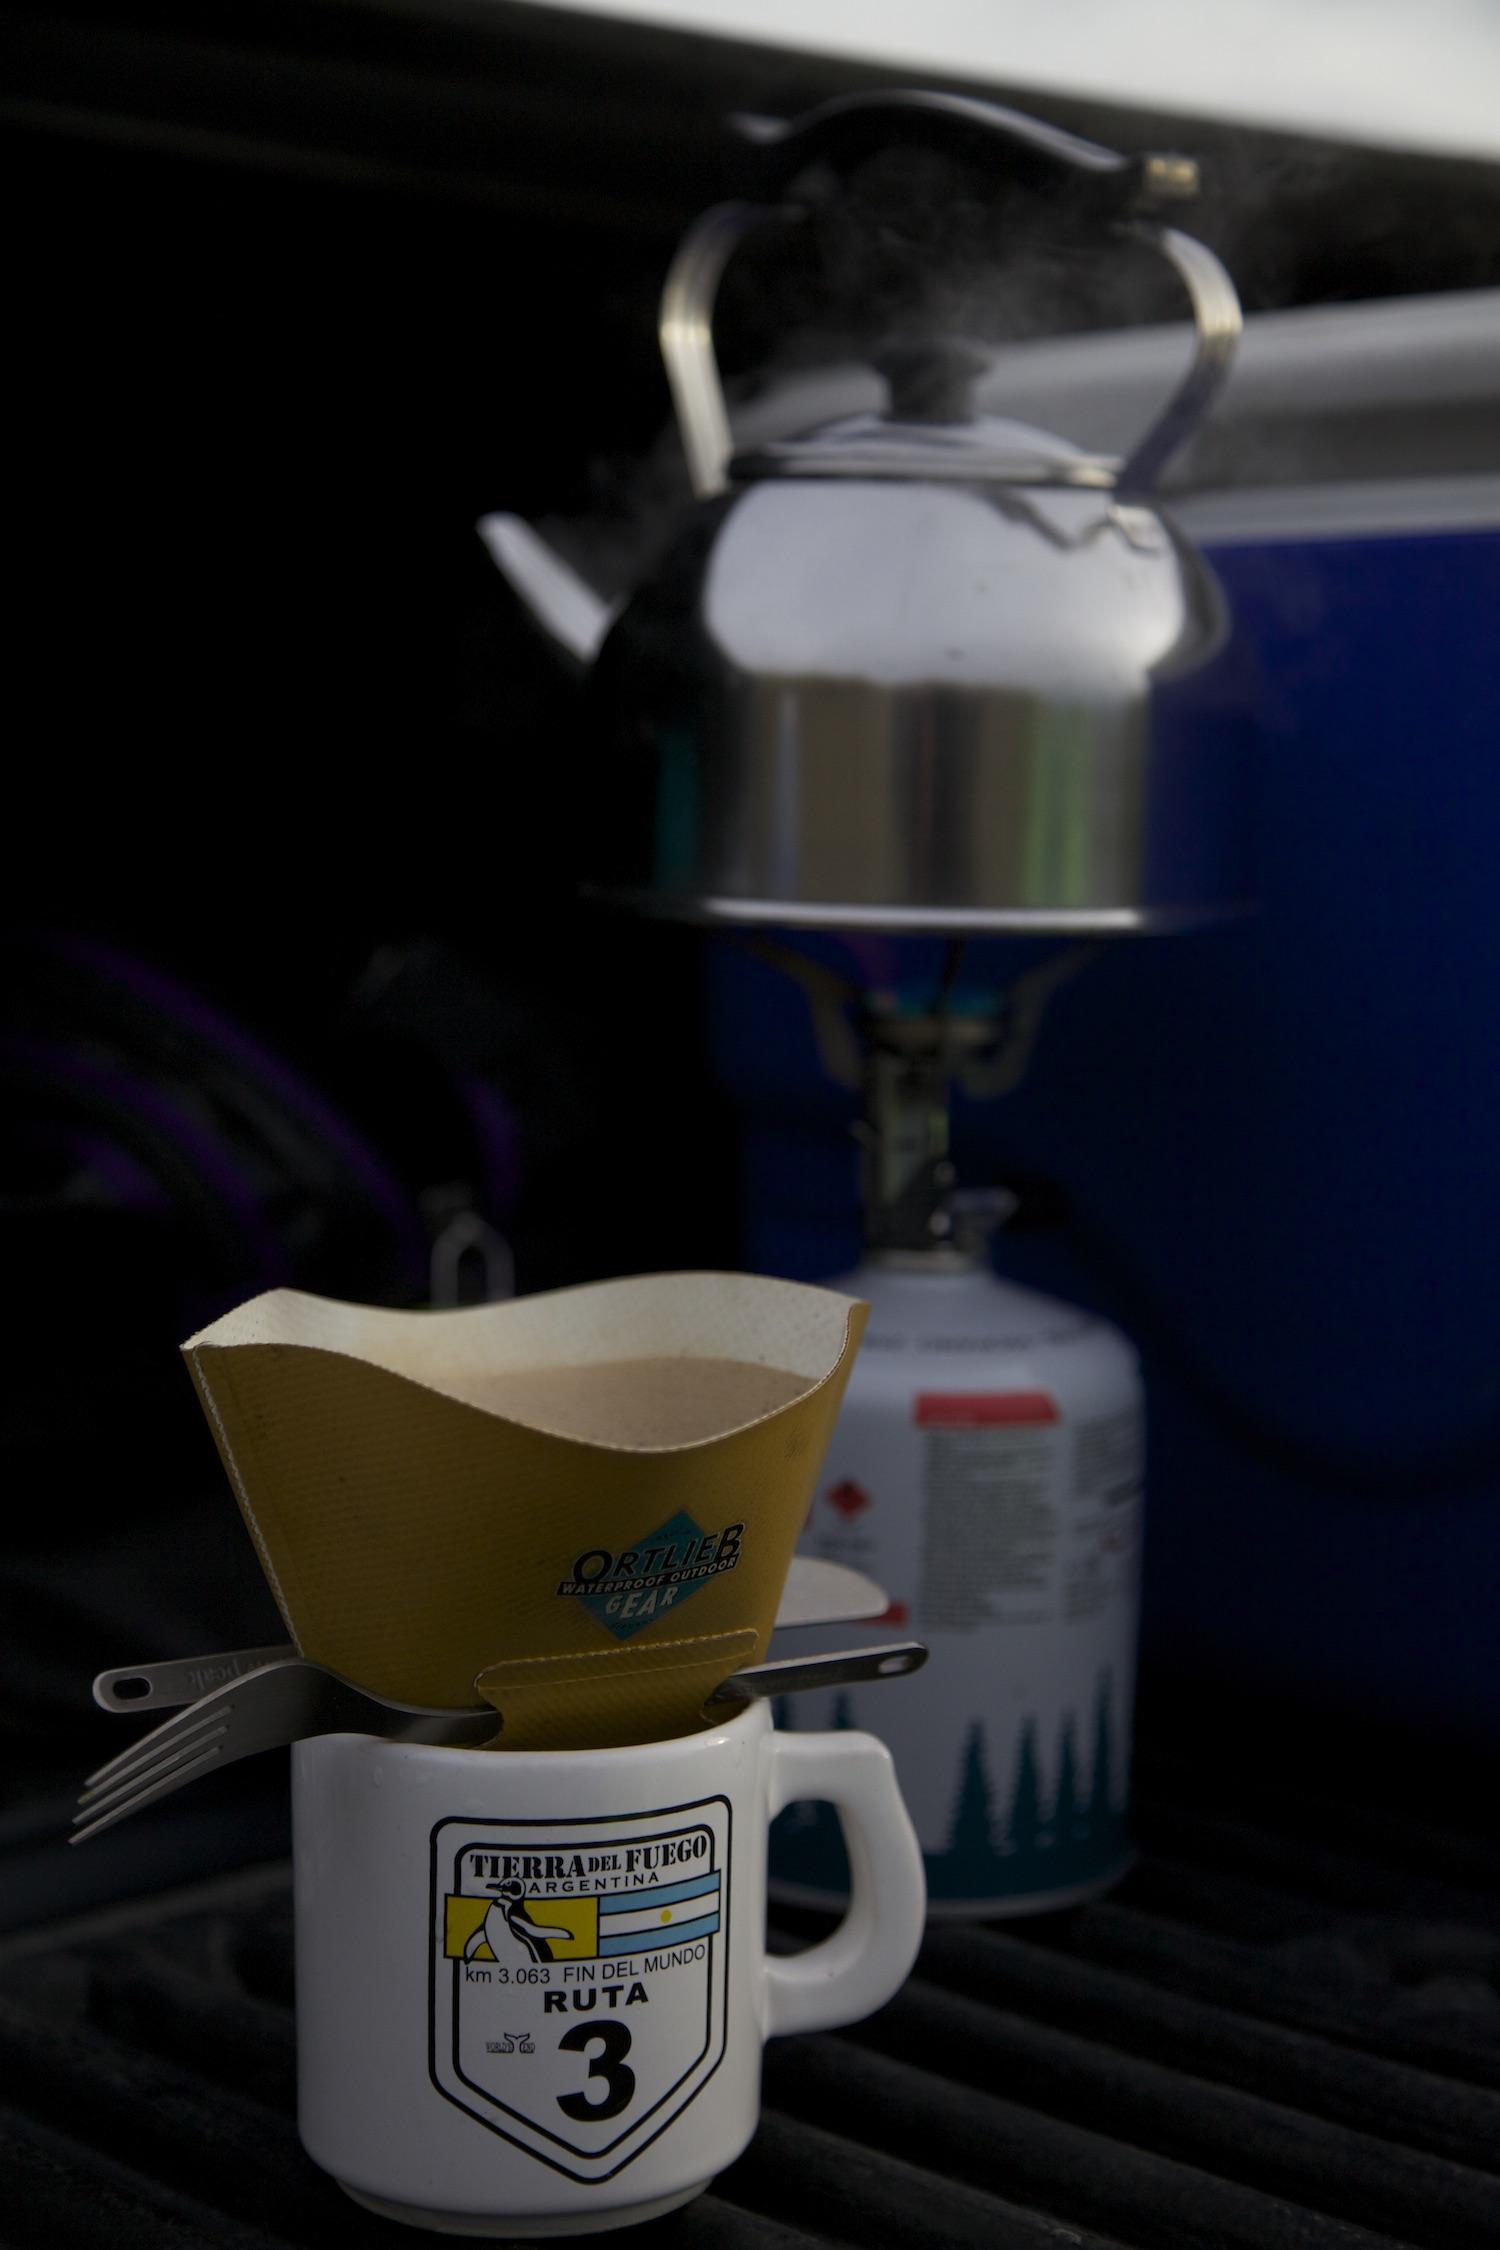 Tacky tourist mug, $15 kettle